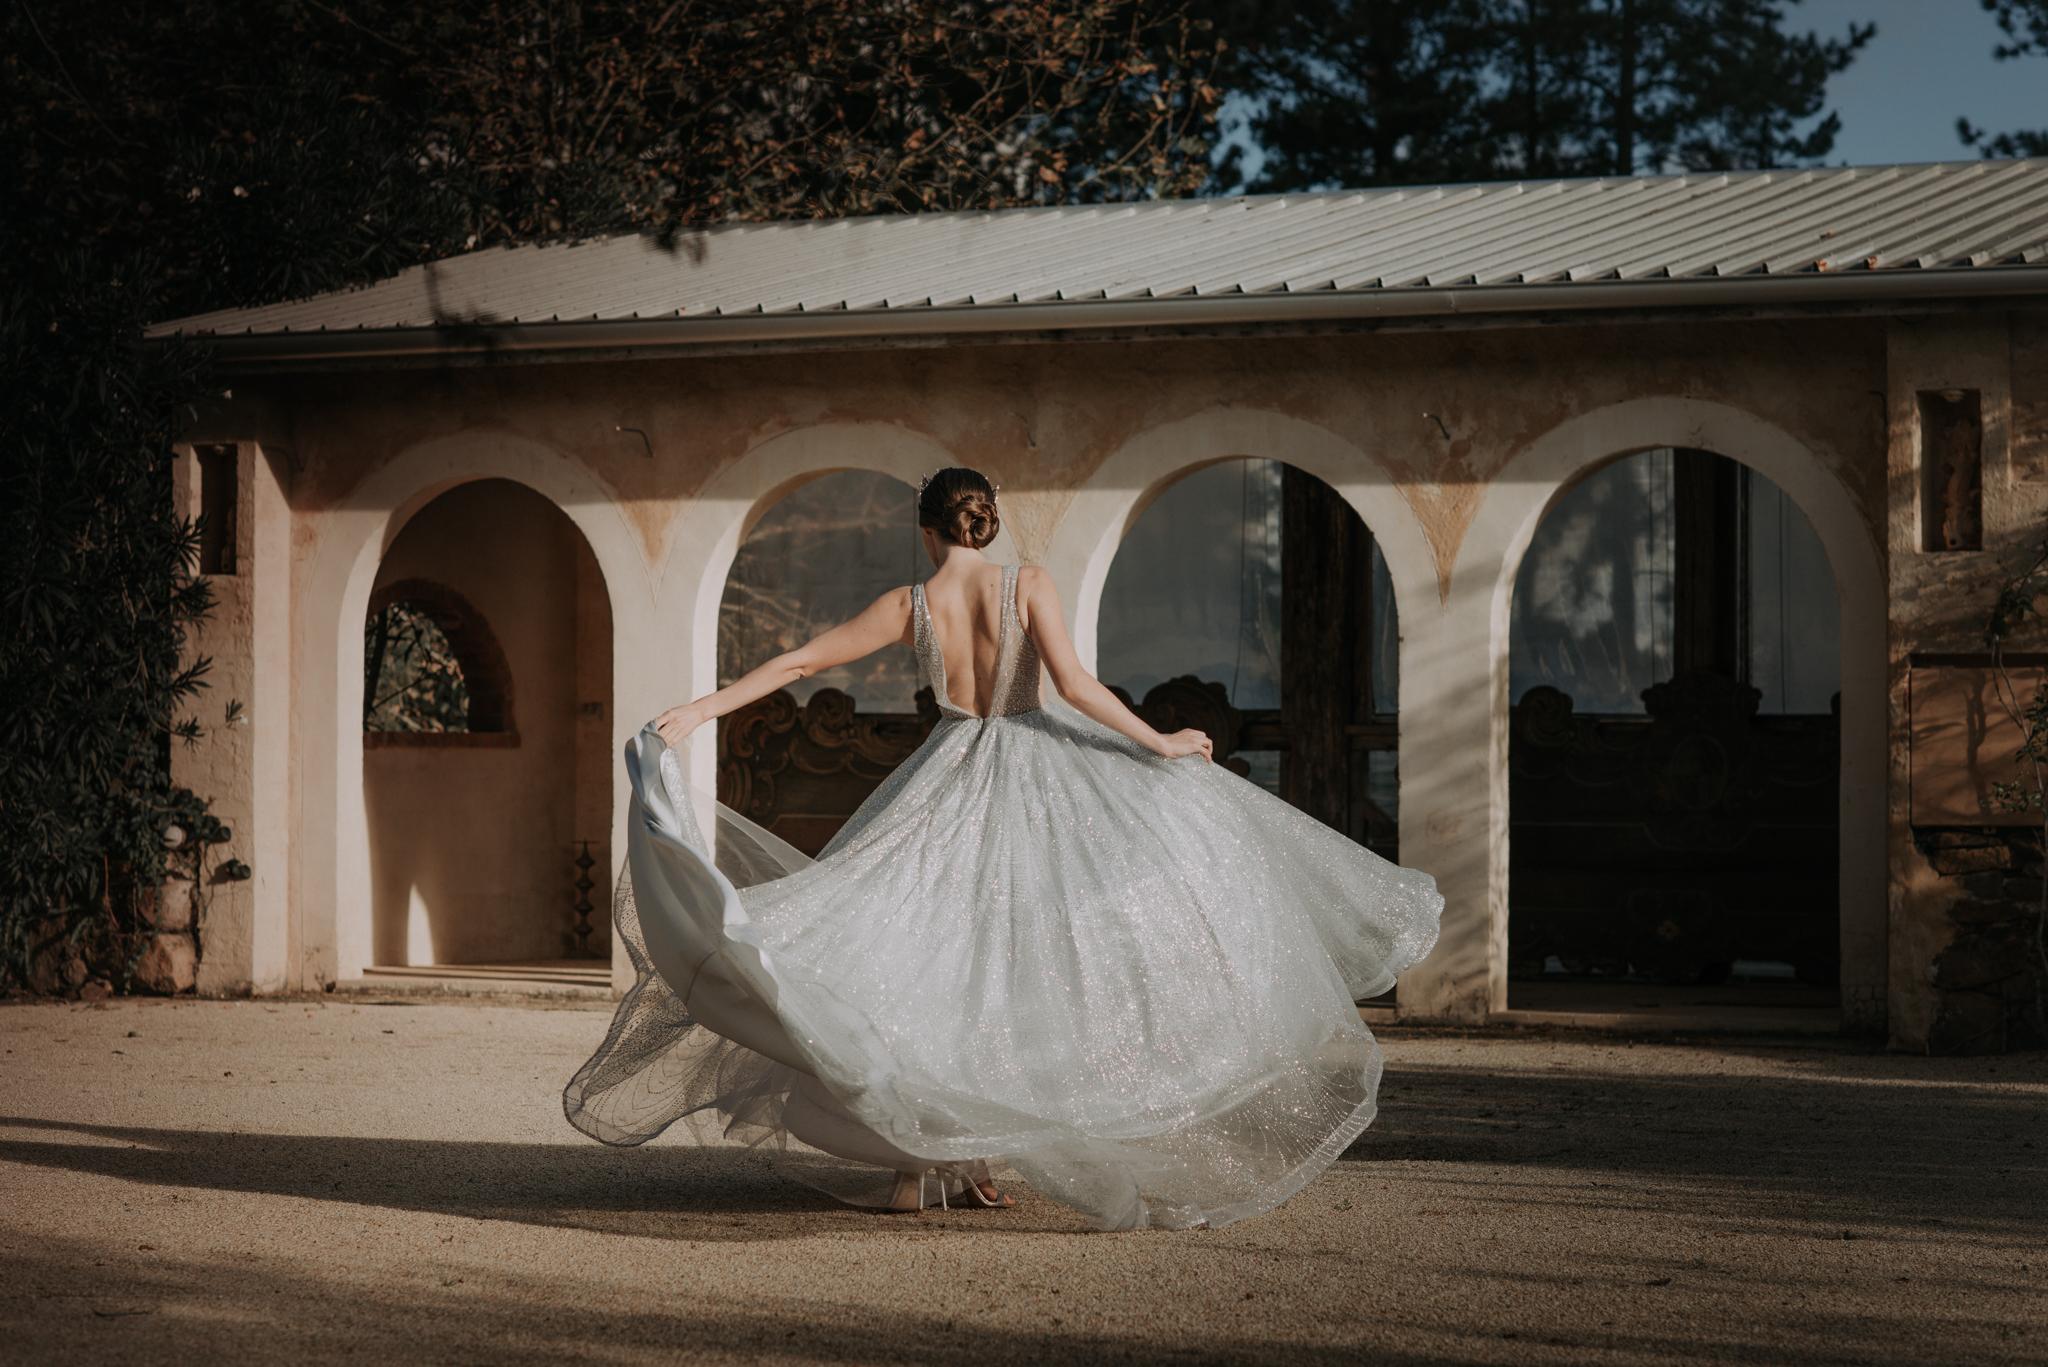 Ulyana Aster Bridal Wedding Gown • Deux Belettes Byron Bay Wedding Photographer • Lovelenscapes • Fashion Photographer • Bloodwood Botanica • Leigh McCoy